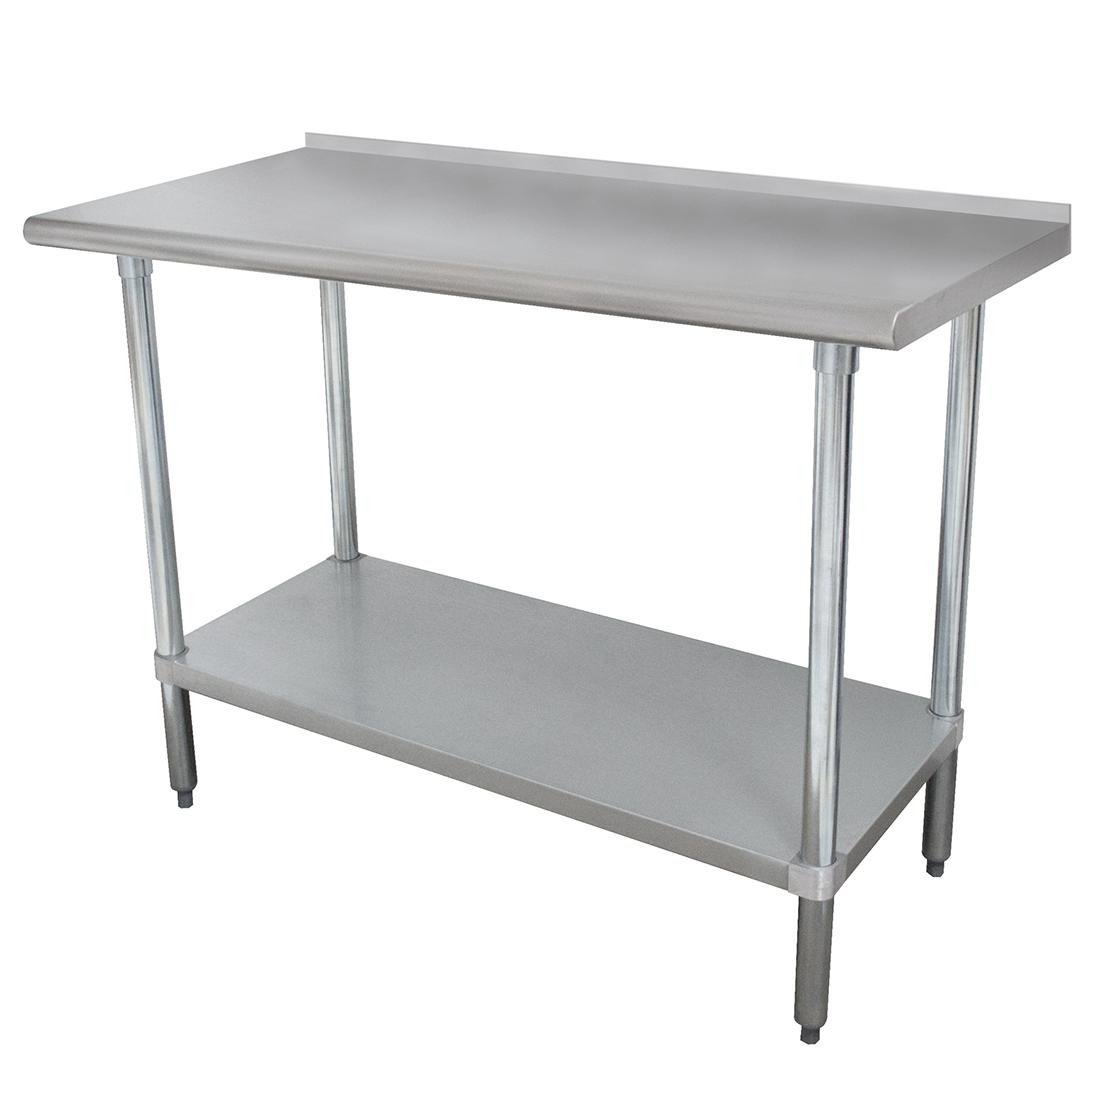 Advance Tabco SFG-363 work table,  36